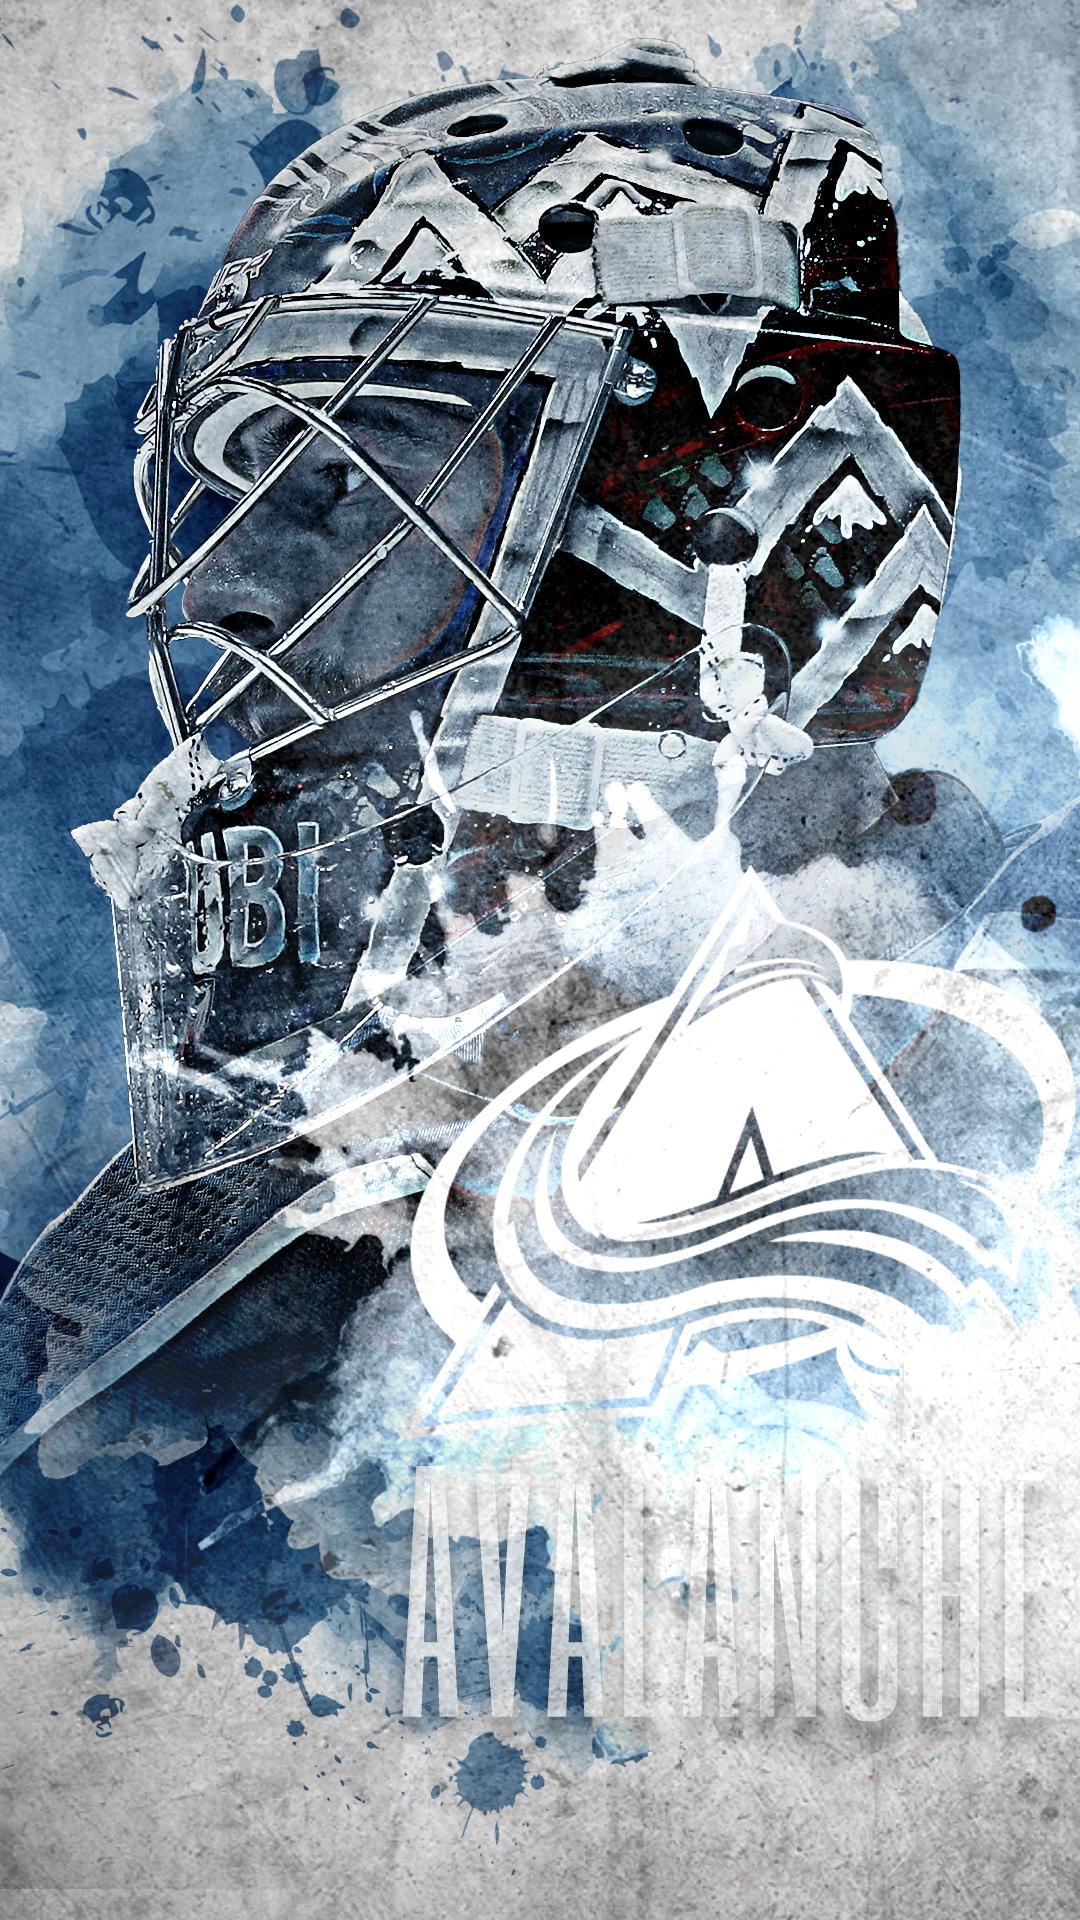 Avs-Graphic-02